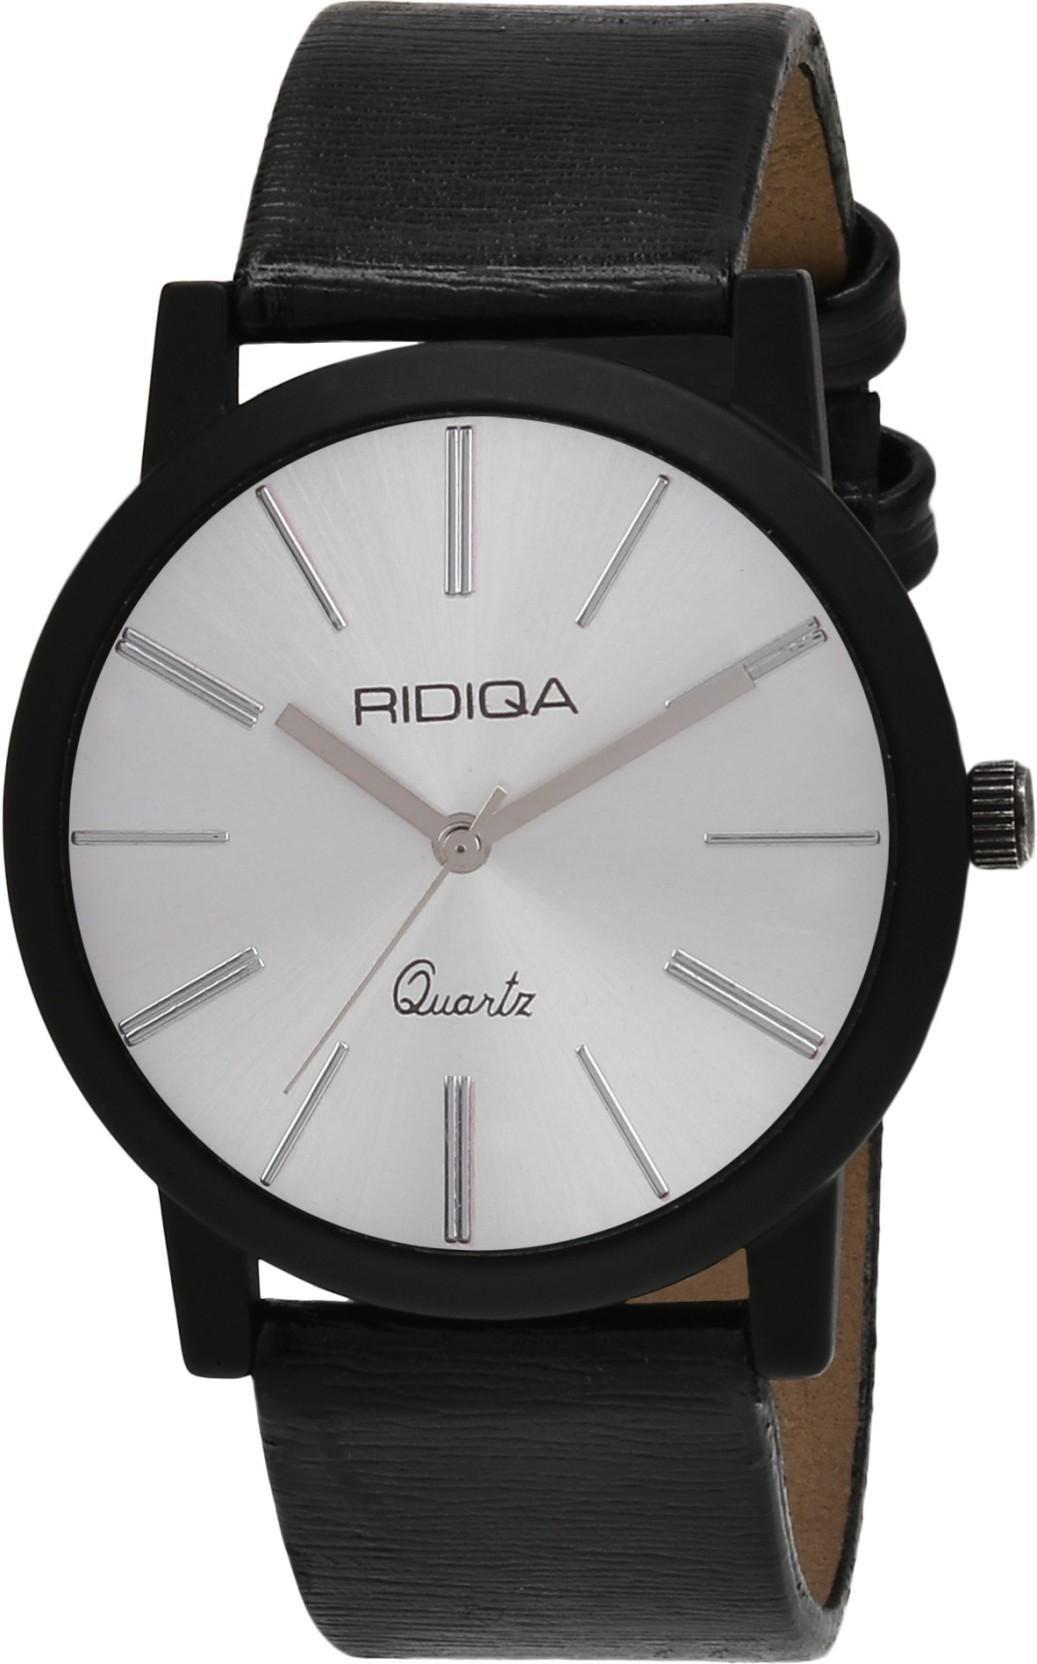 RIDIQA RIDIQA Edge Analog White Dial Slim Men's Watch-RD-45 Watch - For Boys